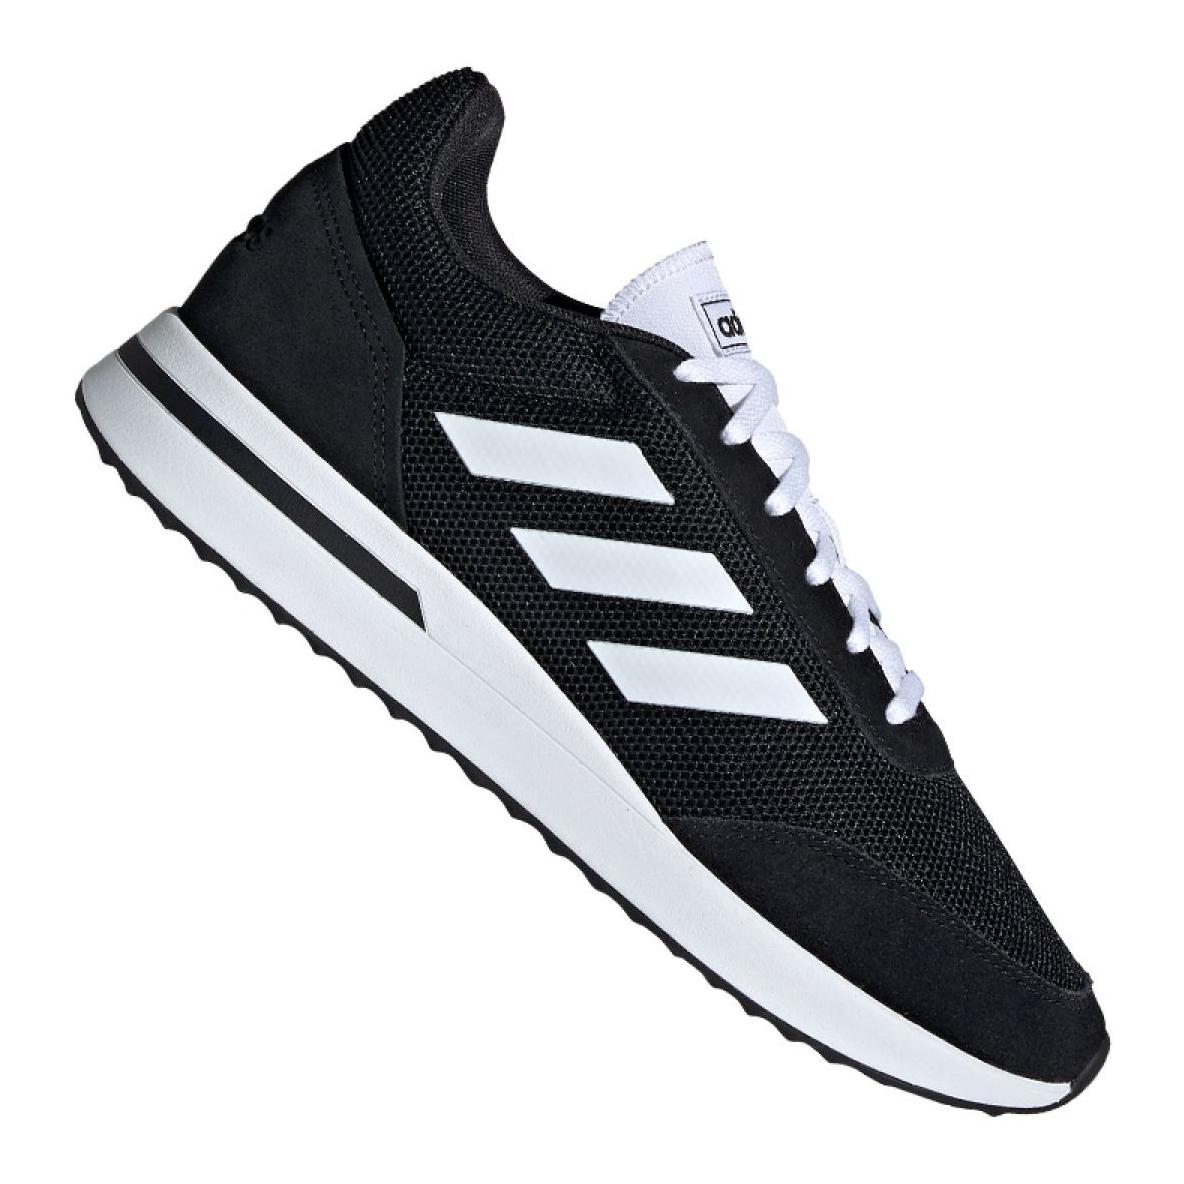 Schwarz Adidas Swift Run M B37730 Schuhe